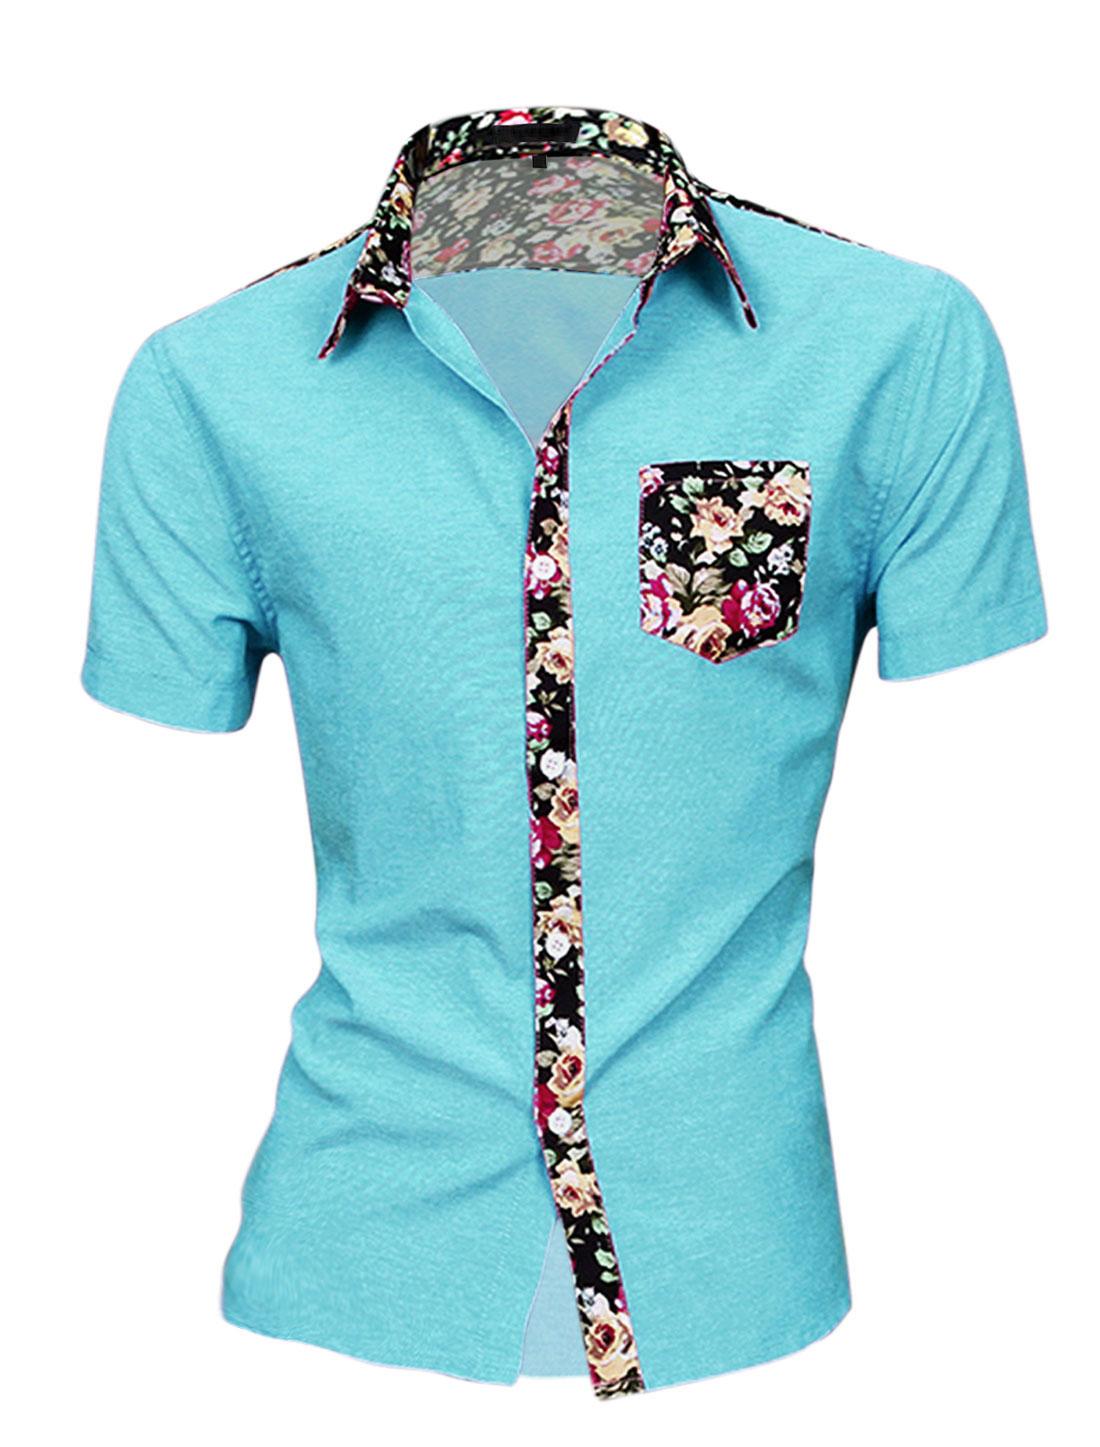 Men Floral Print Round Hem Chest Pocket Short Sleeve Button Down Shirt Sky Blue M